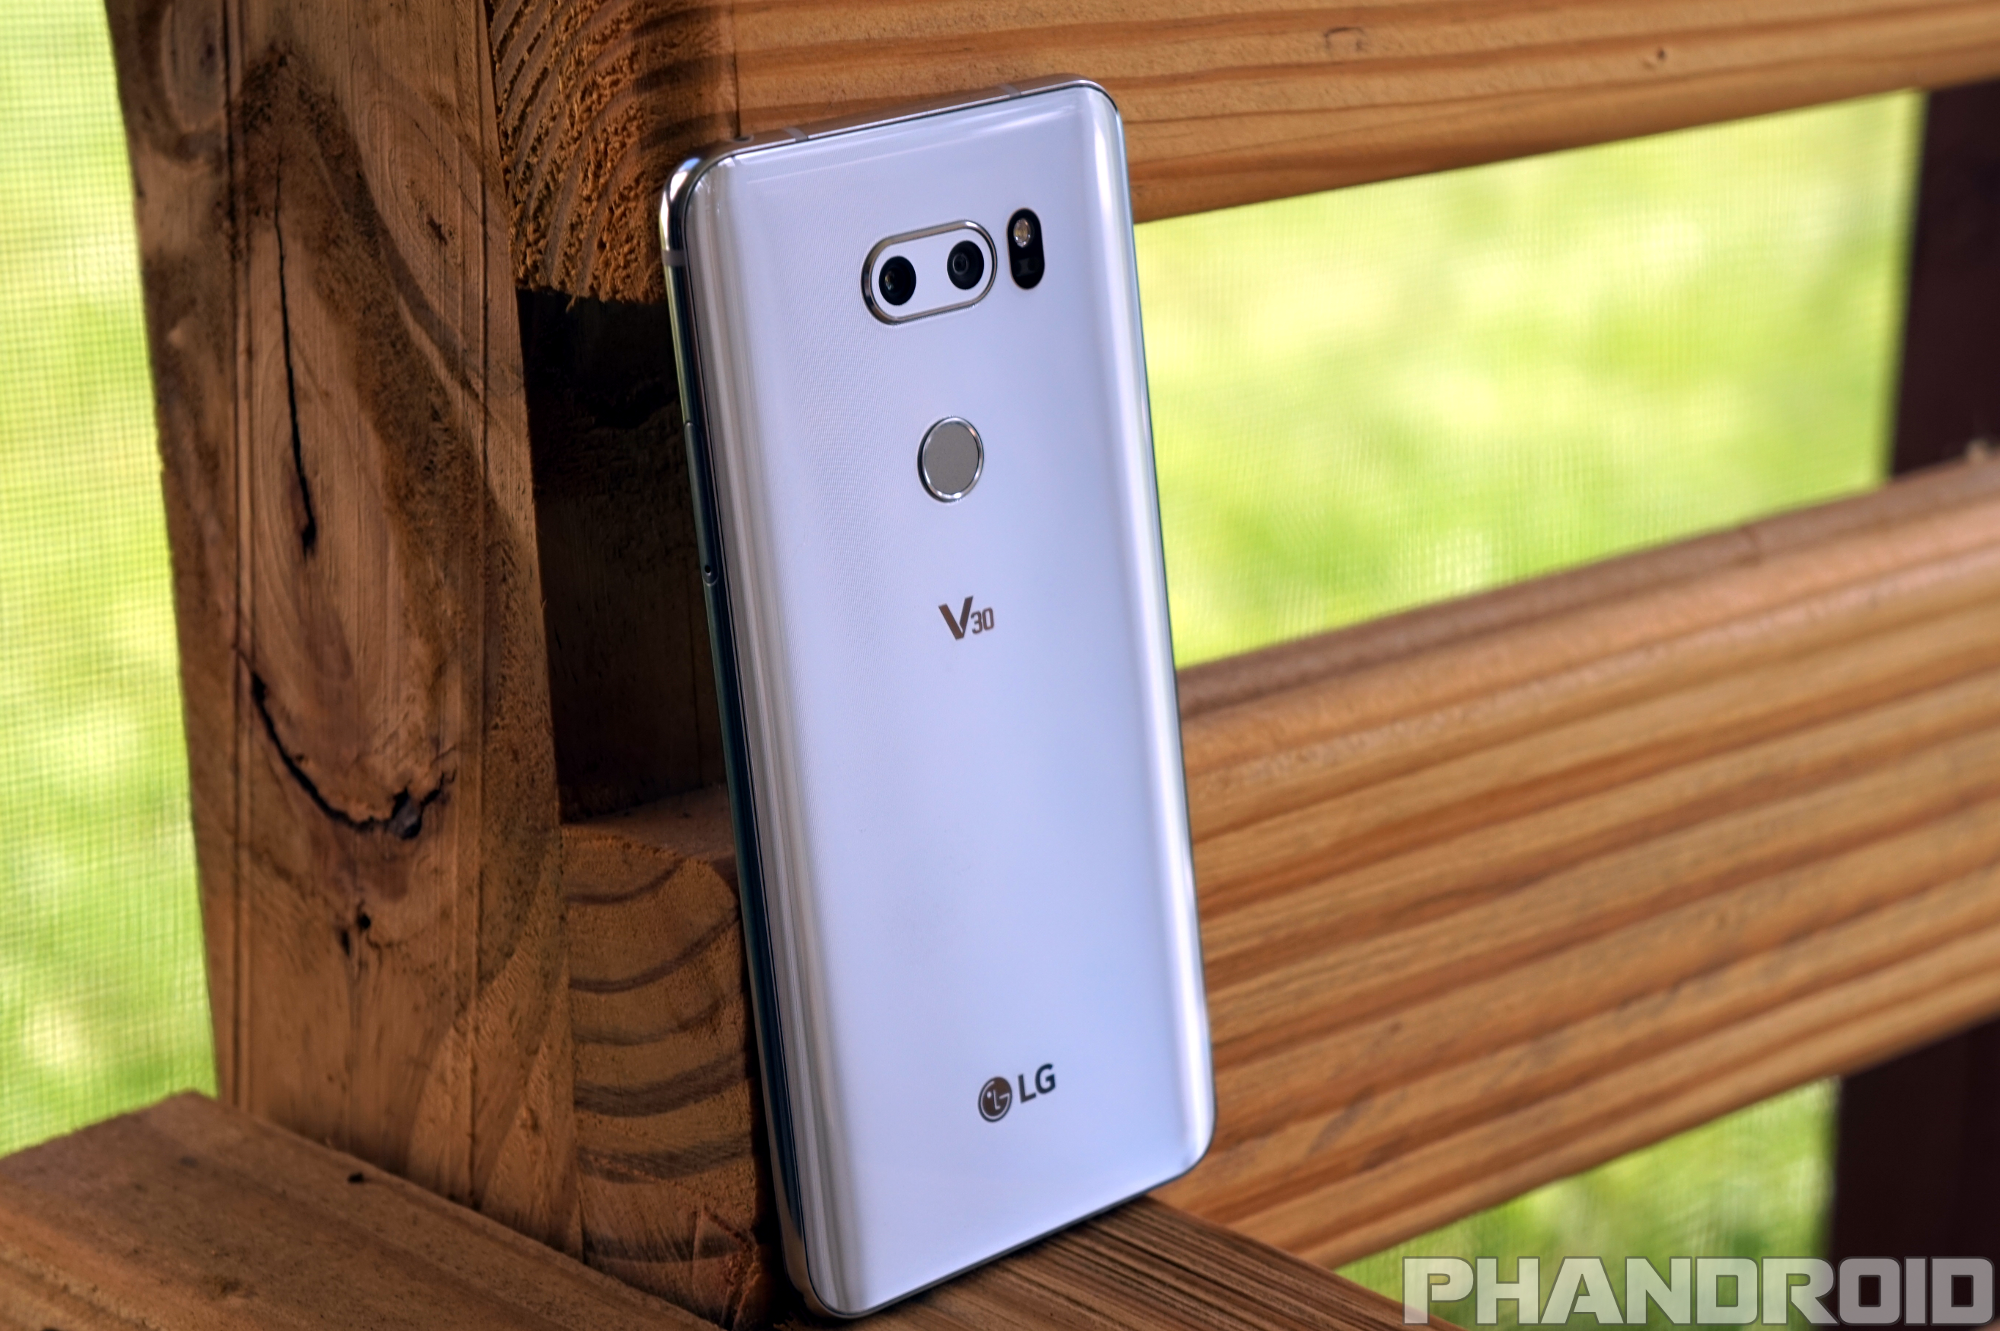 Get the LG V30 camera app on your LG G6